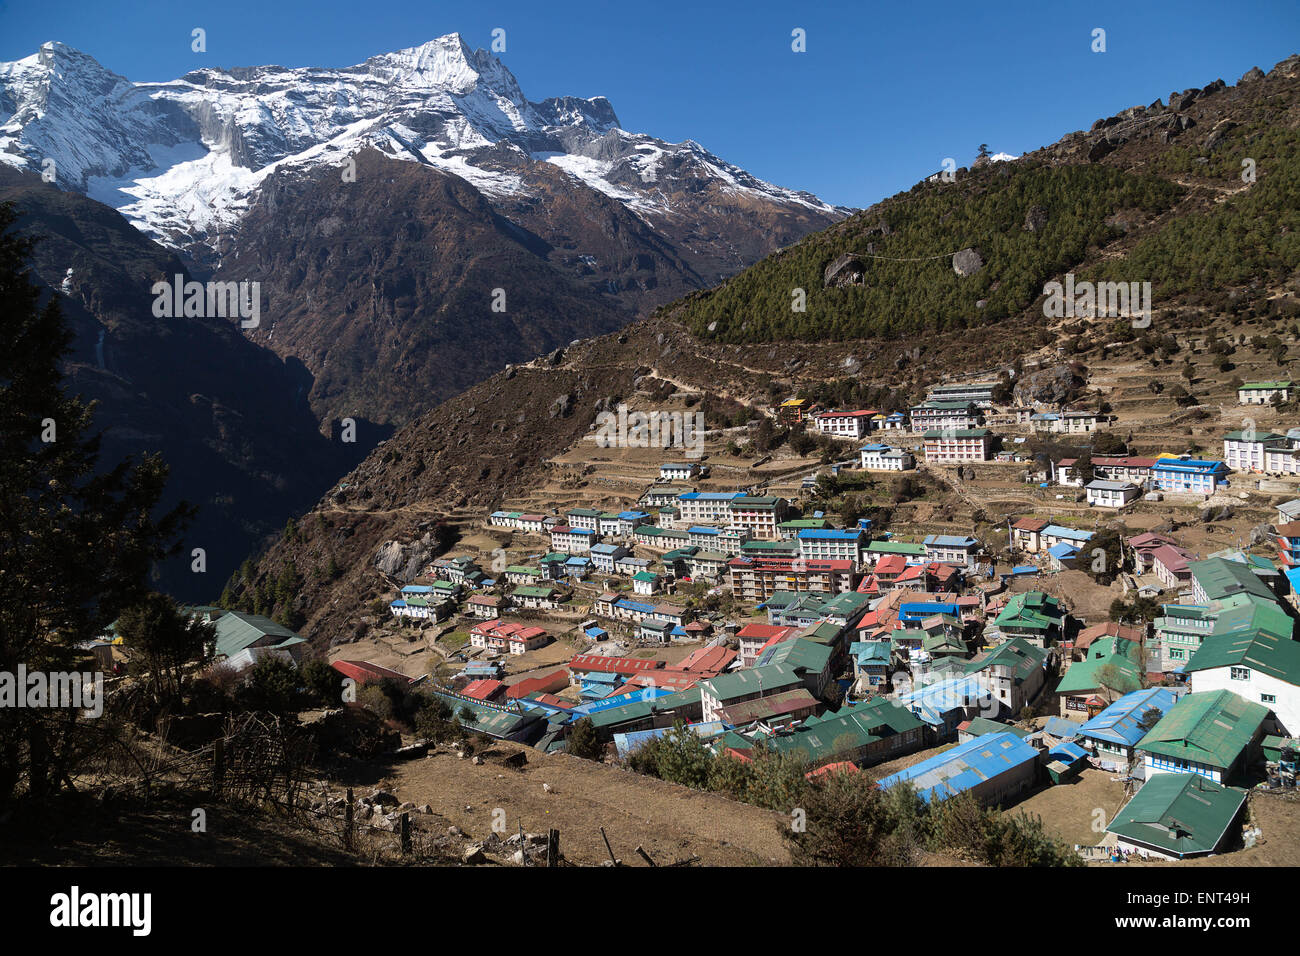 Namche Bazaar (3440m) and Kongde Ri (6187m), Everest Trail, Nepal - Stock Image